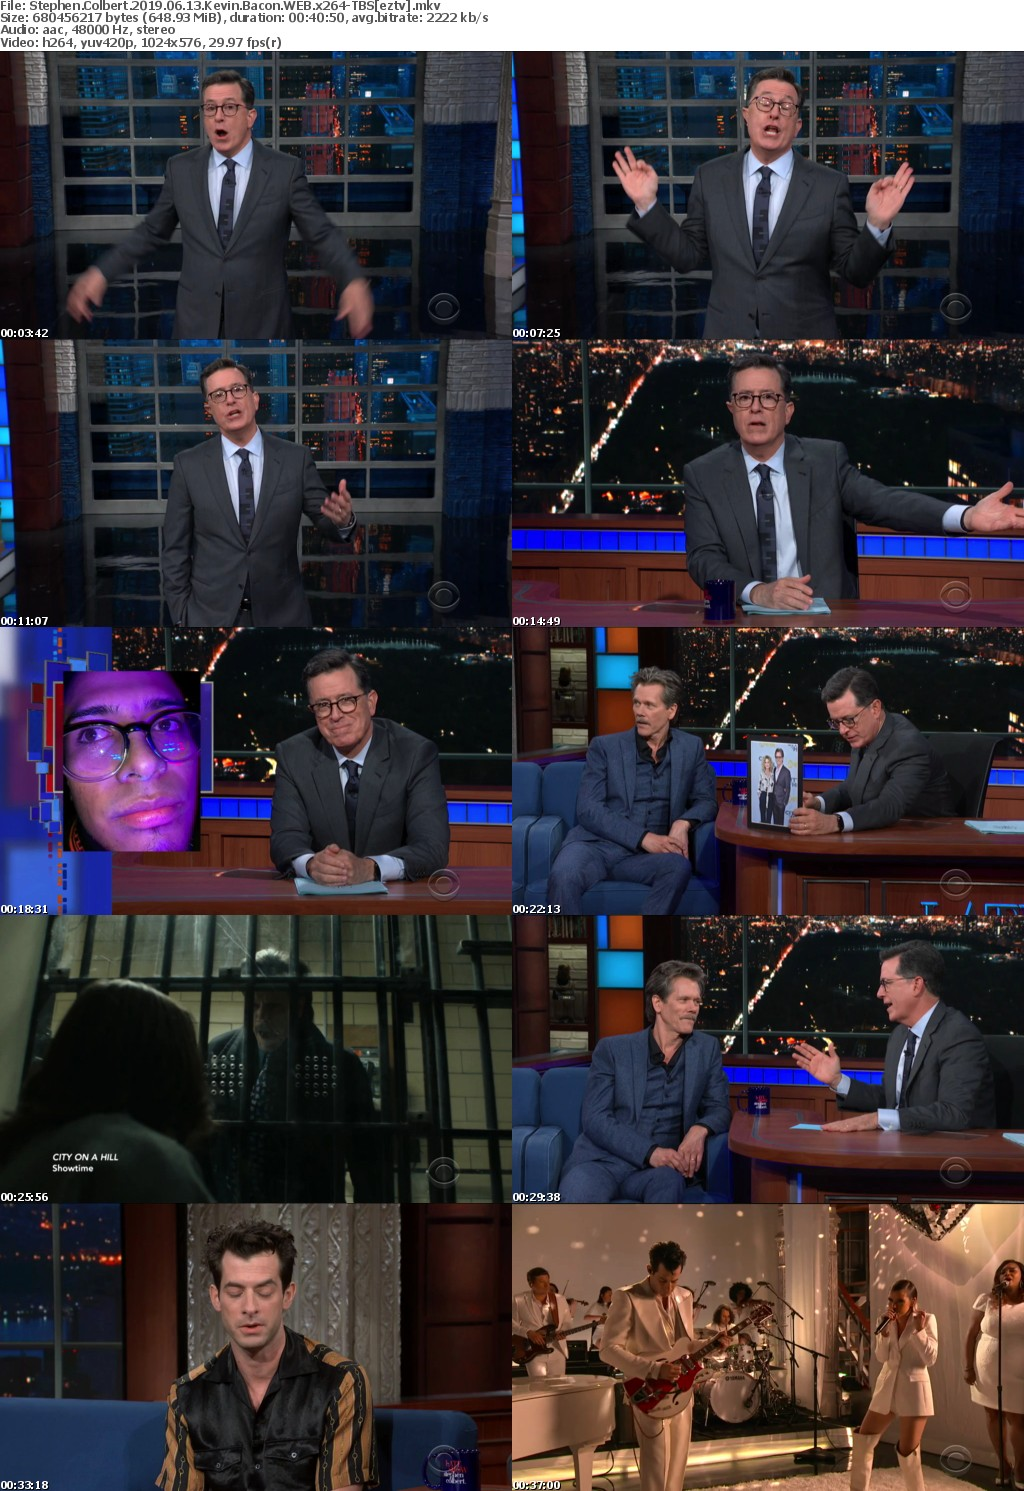 Stephen Colbert 2019 06 13 Kevin Bacon WEB x264-TBS